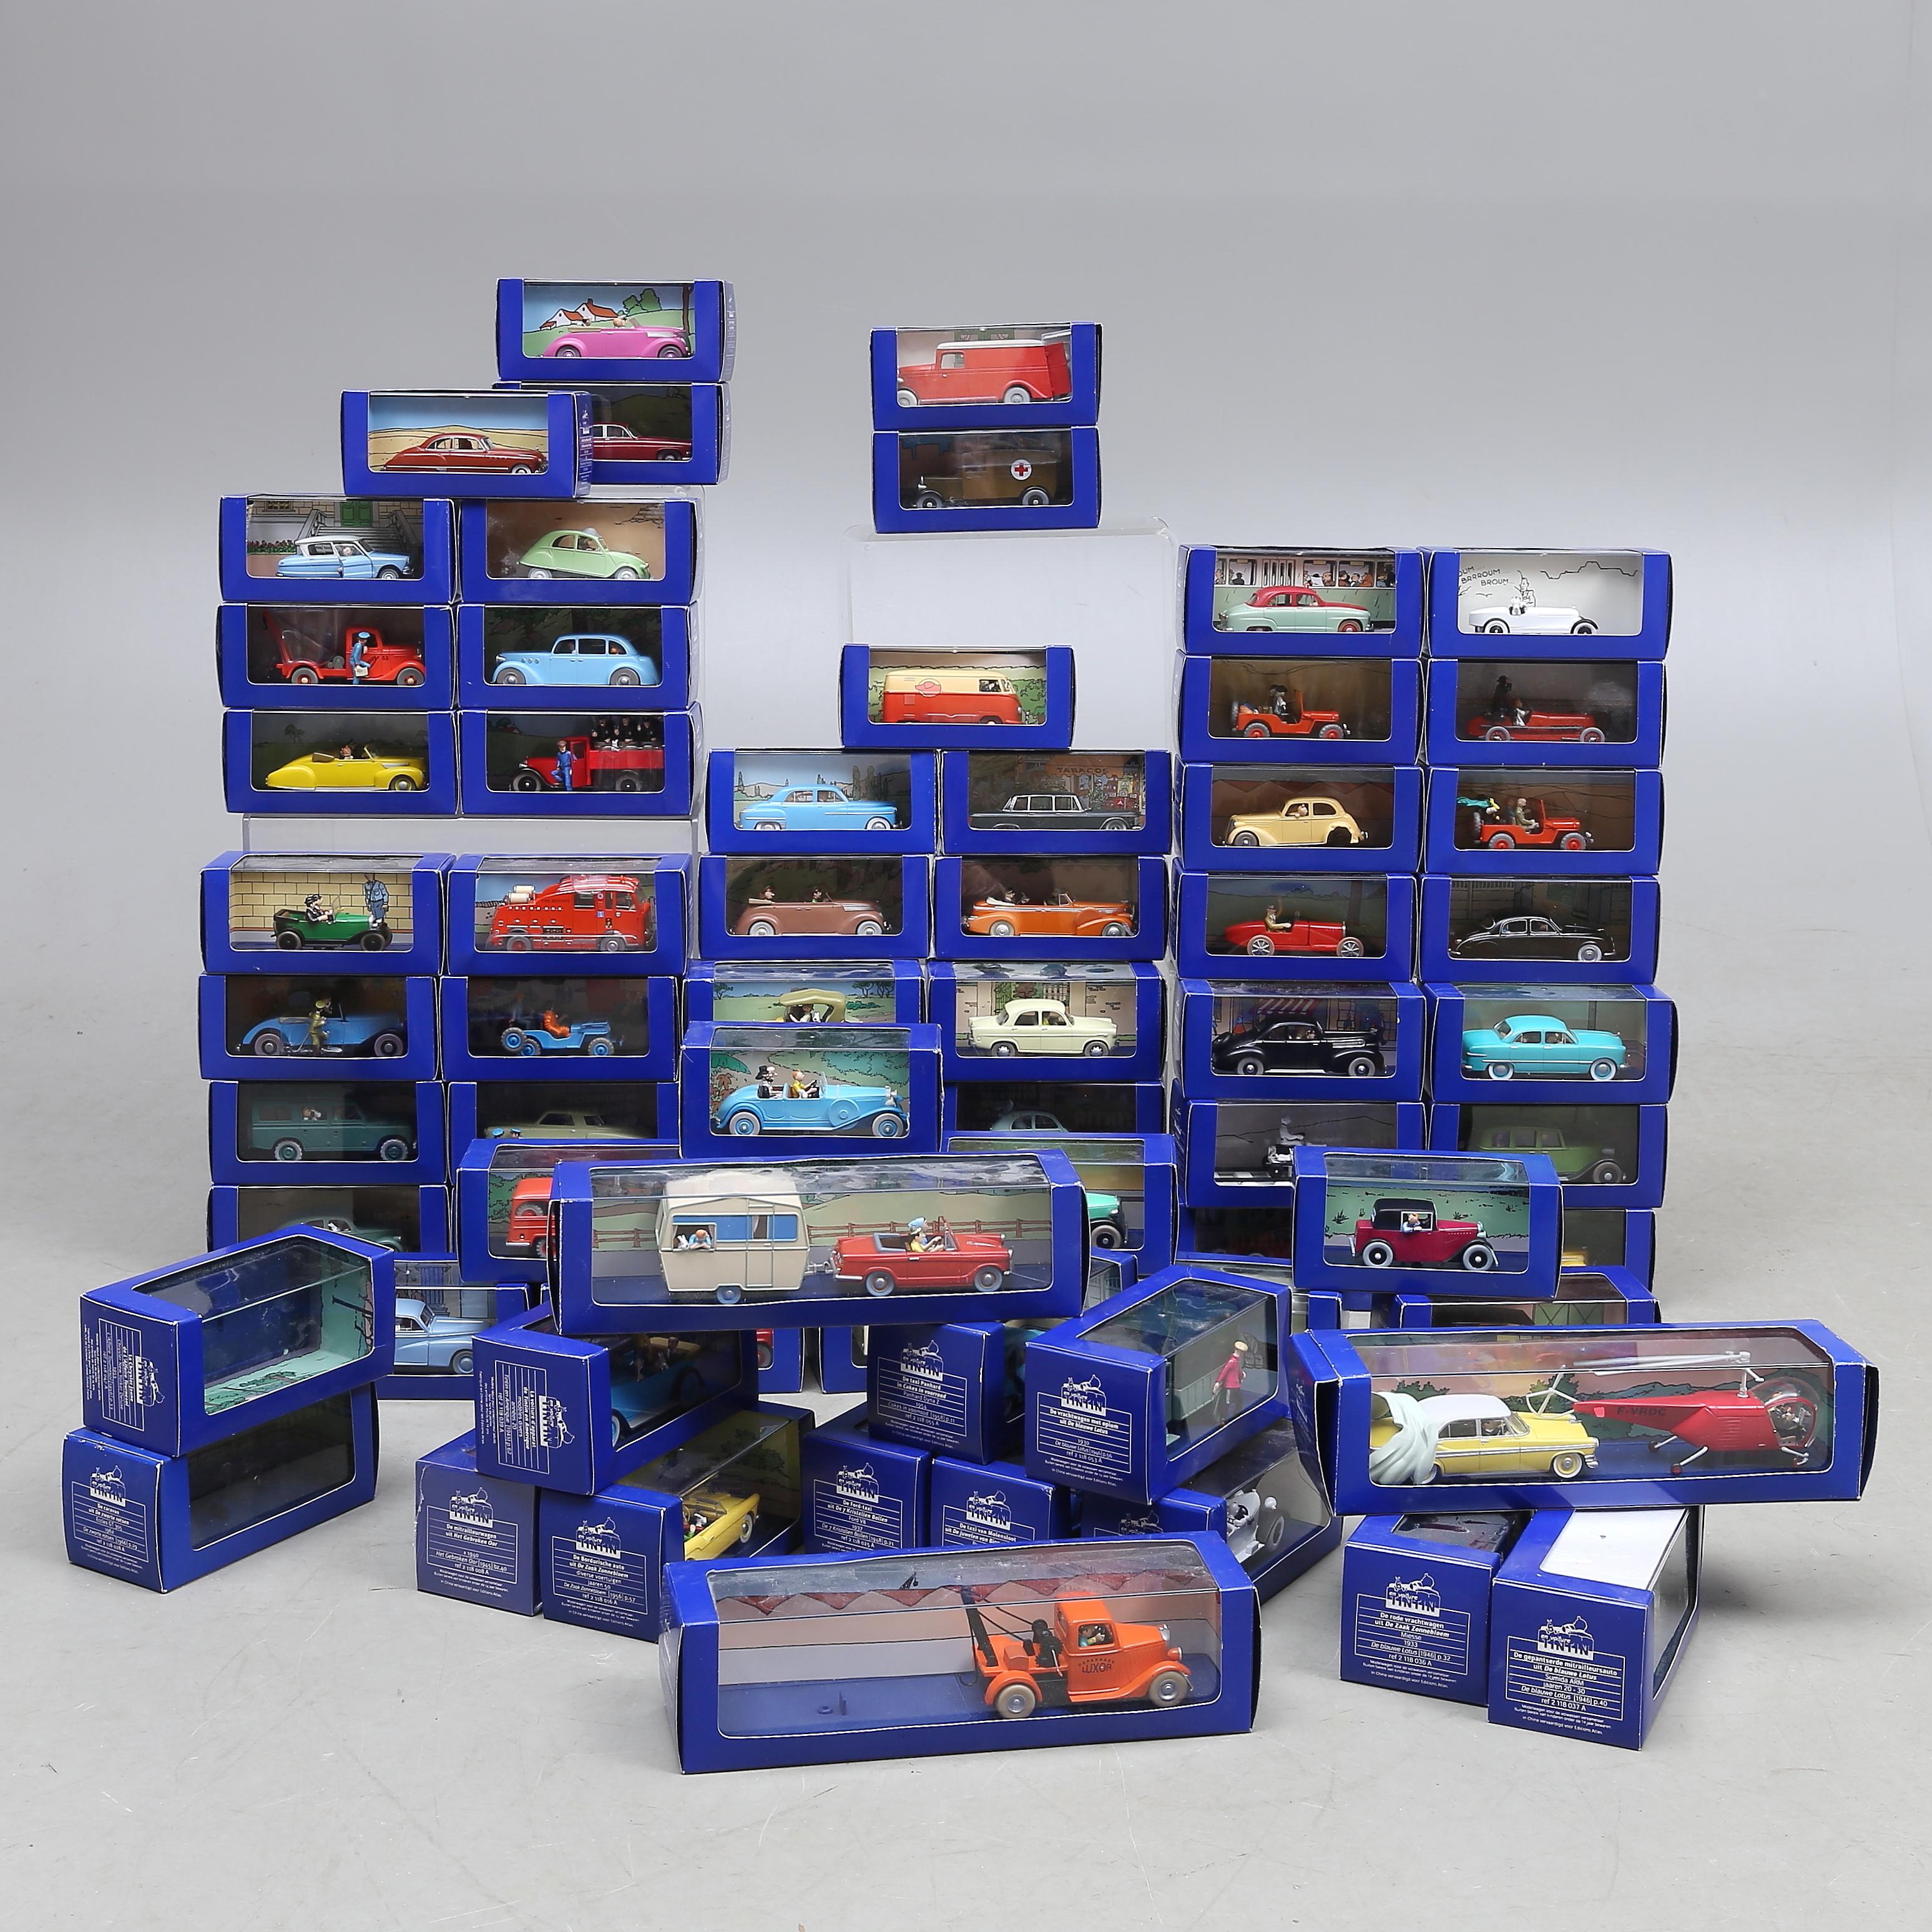 tintin komplet samling